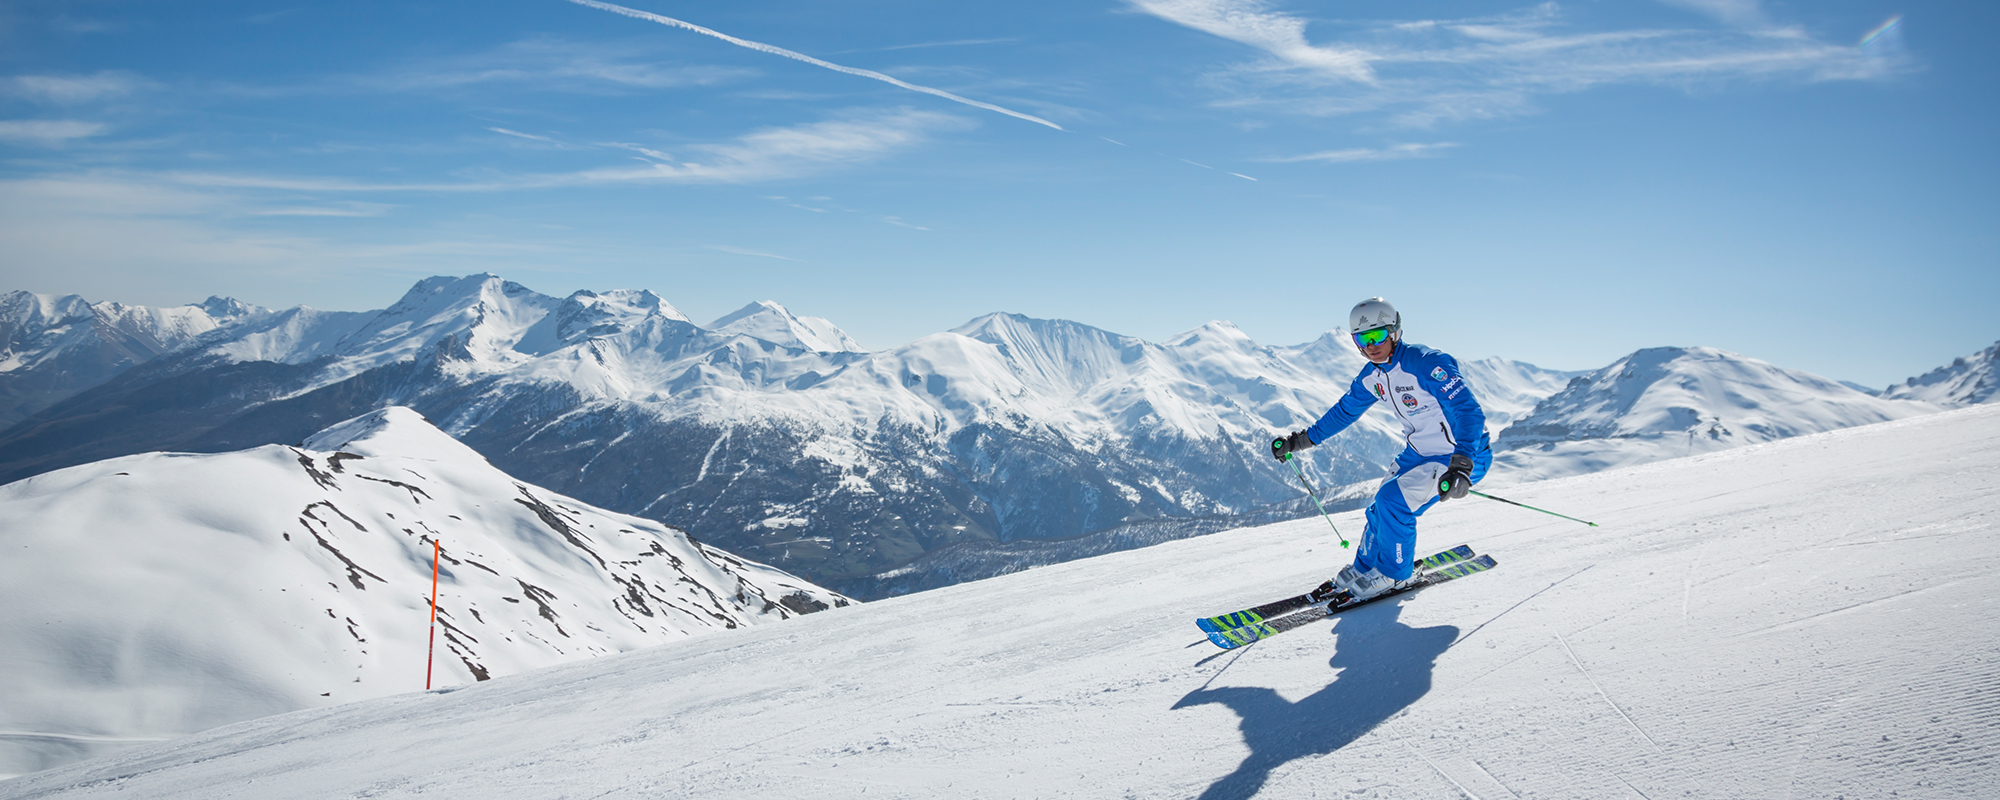 Skiing Sauze d'Oulx